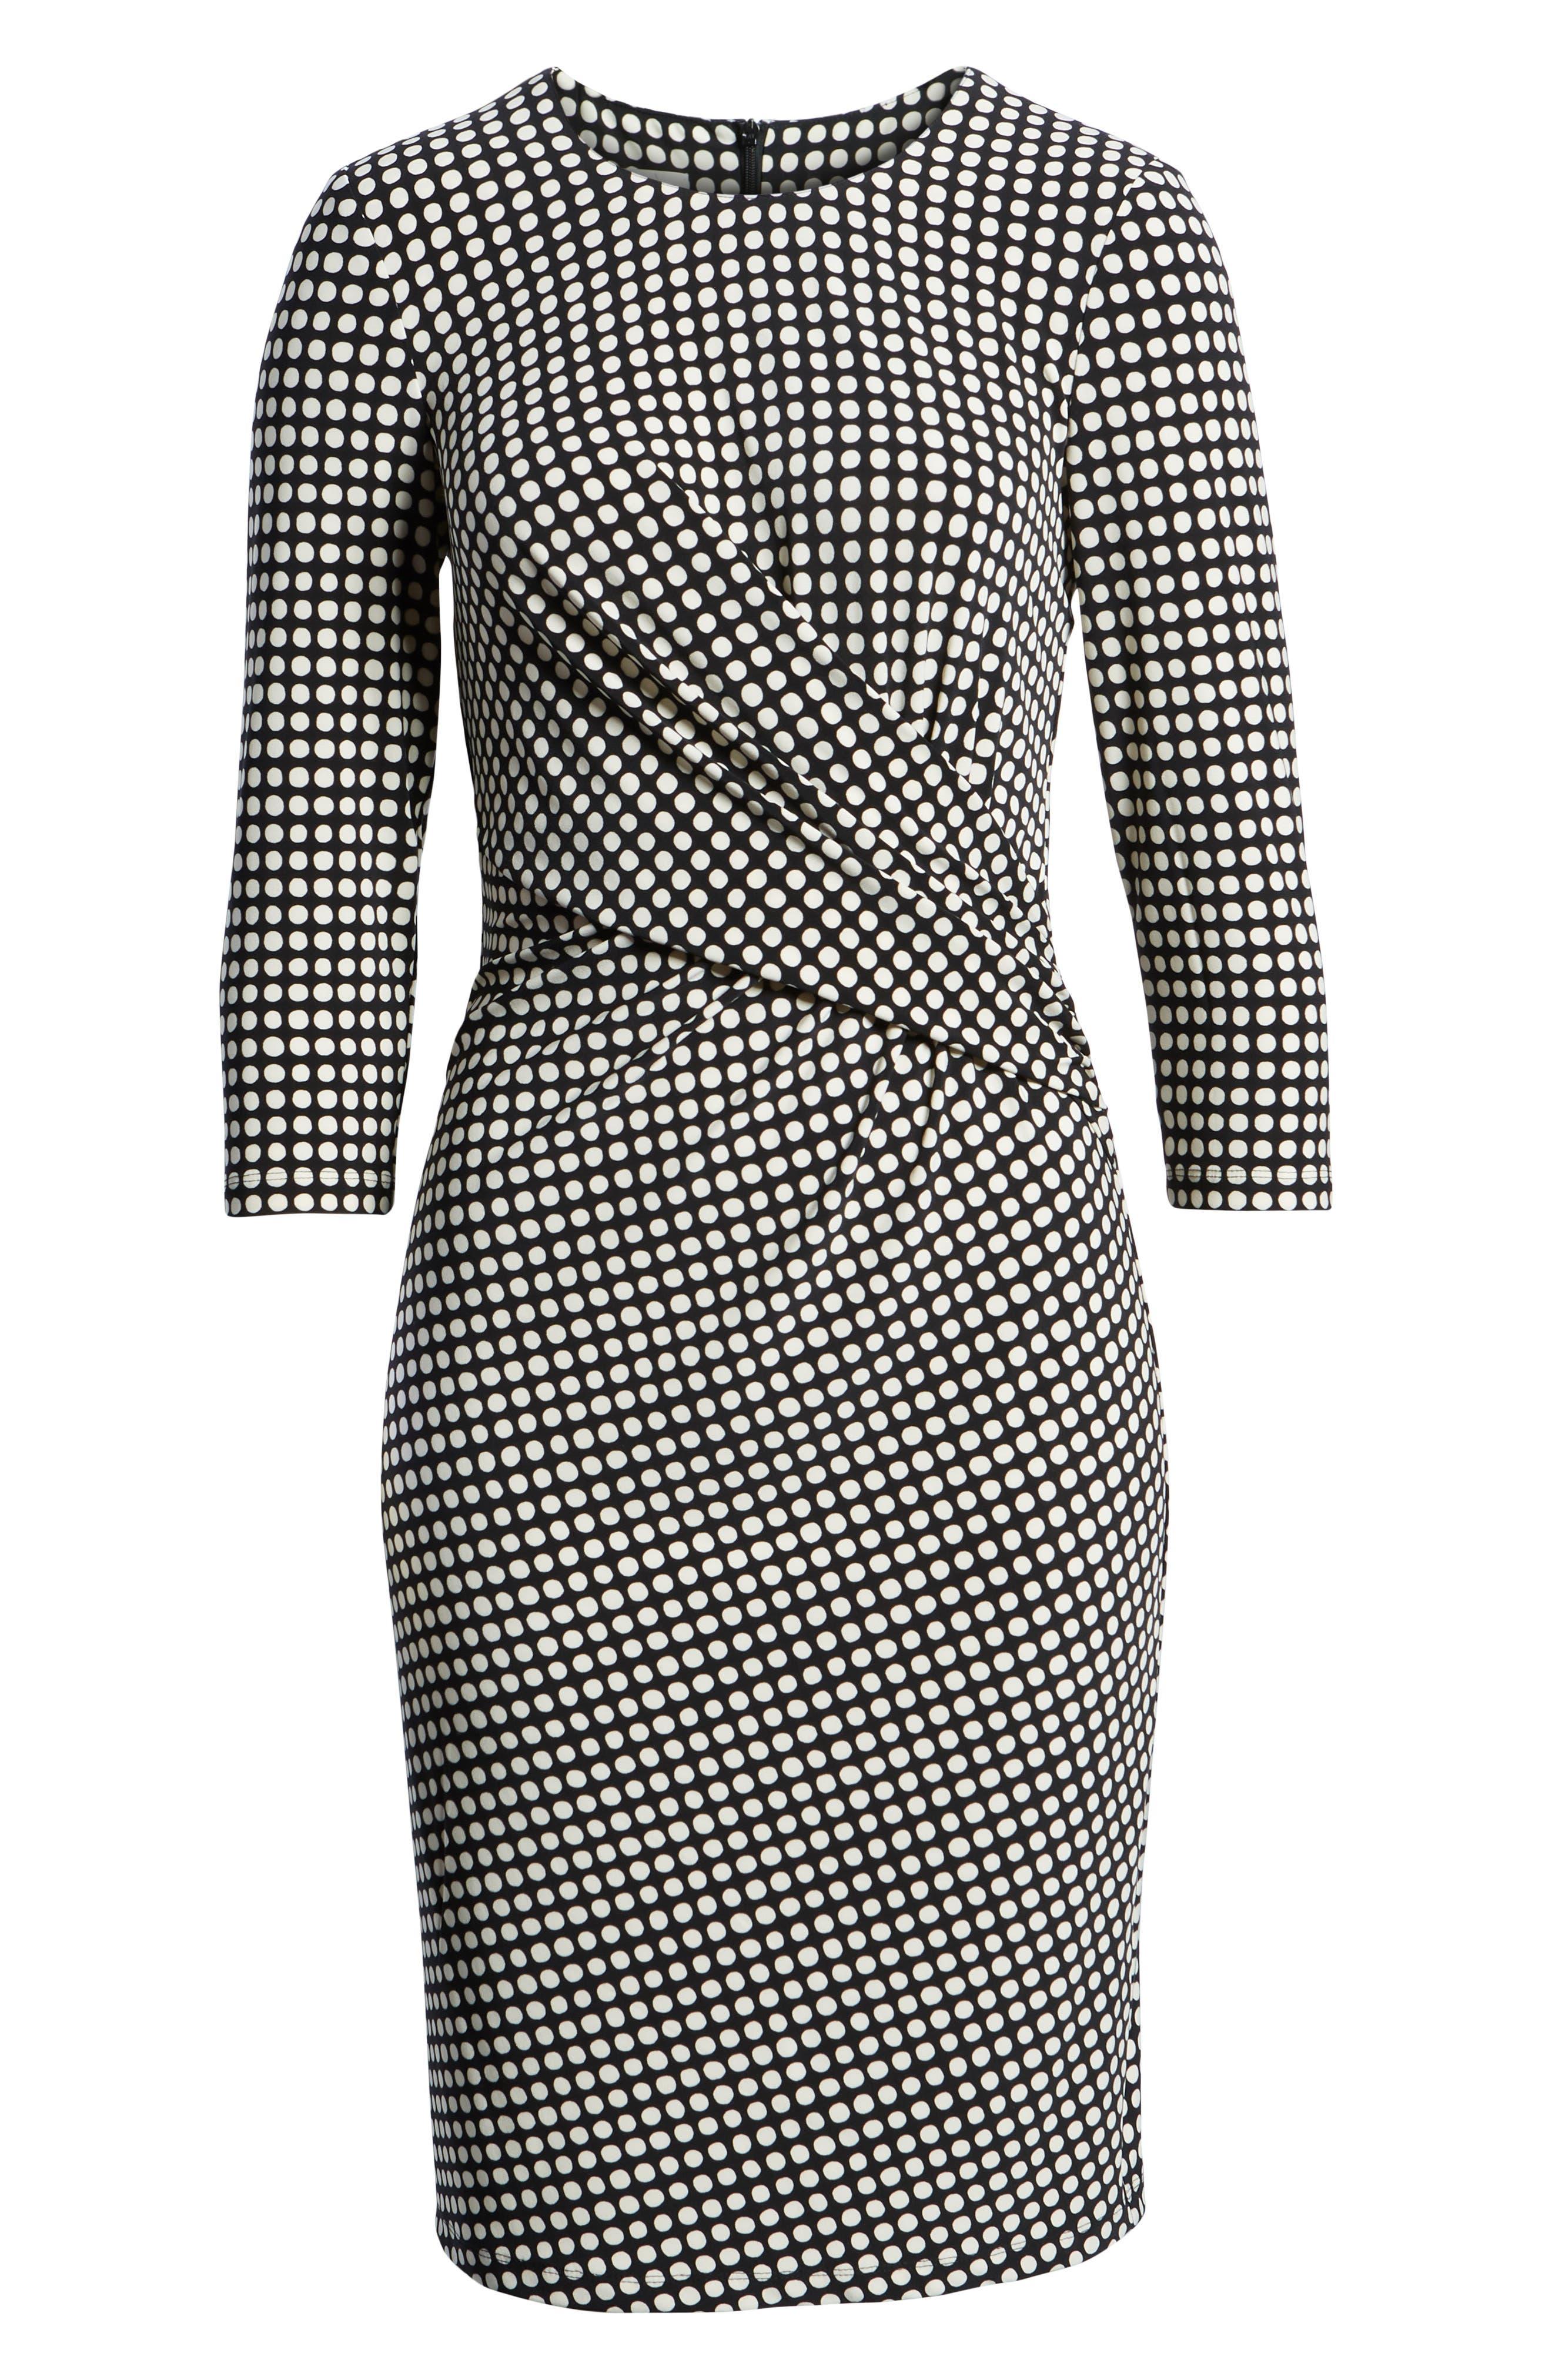 Polka Dot Faux Wrap Dress,                             Alternate thumbnail 7, color,                             Black/ Parchment